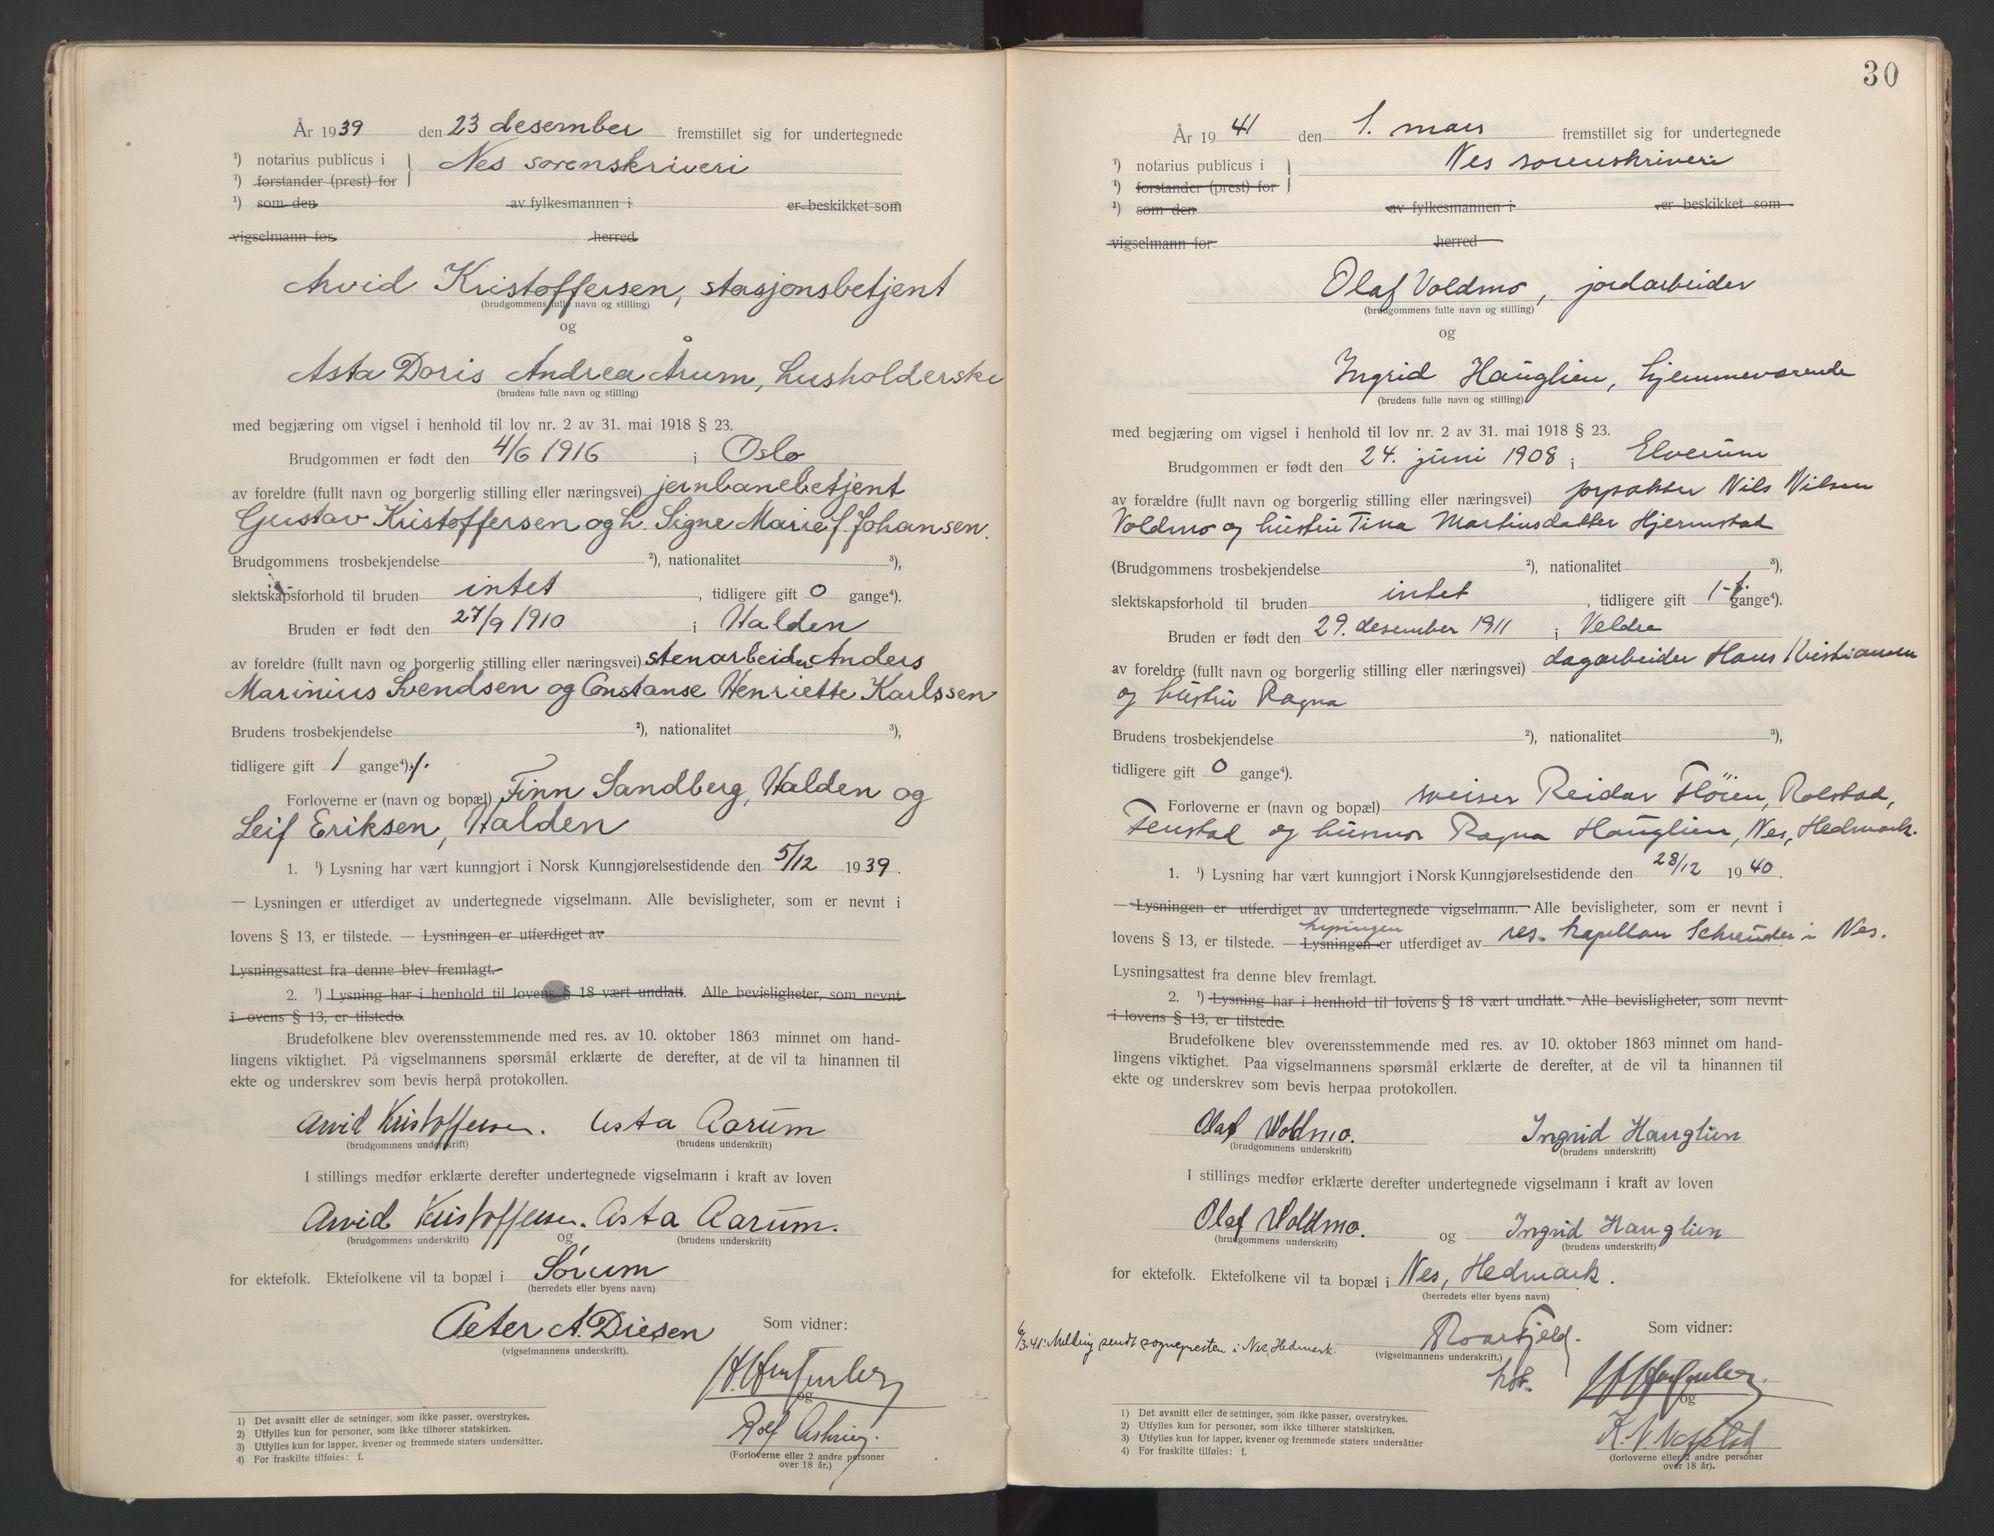 SAO, Nes tingrett, L/Lc/Lca/L0001: Vigselbok, 1920-1943, s. 30